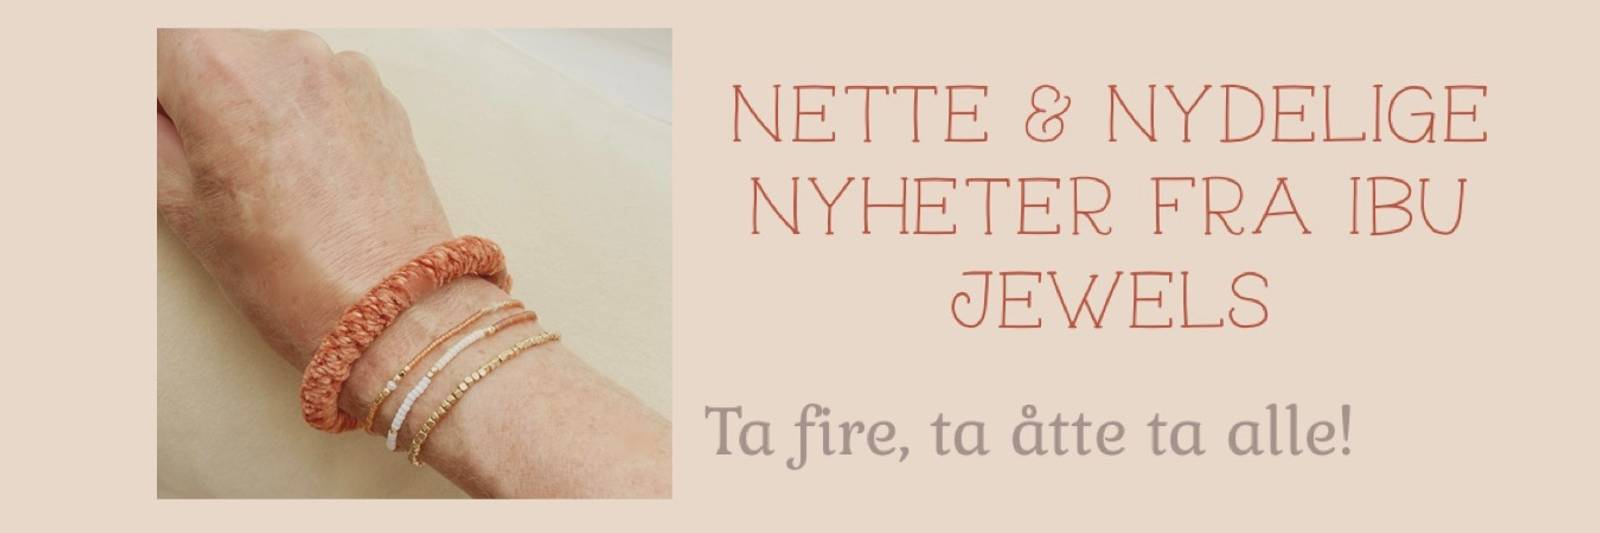 IBU jewels forhandles i Norge av Studio Mollis.  Forhandler i Norge IBU Studio Mollis.